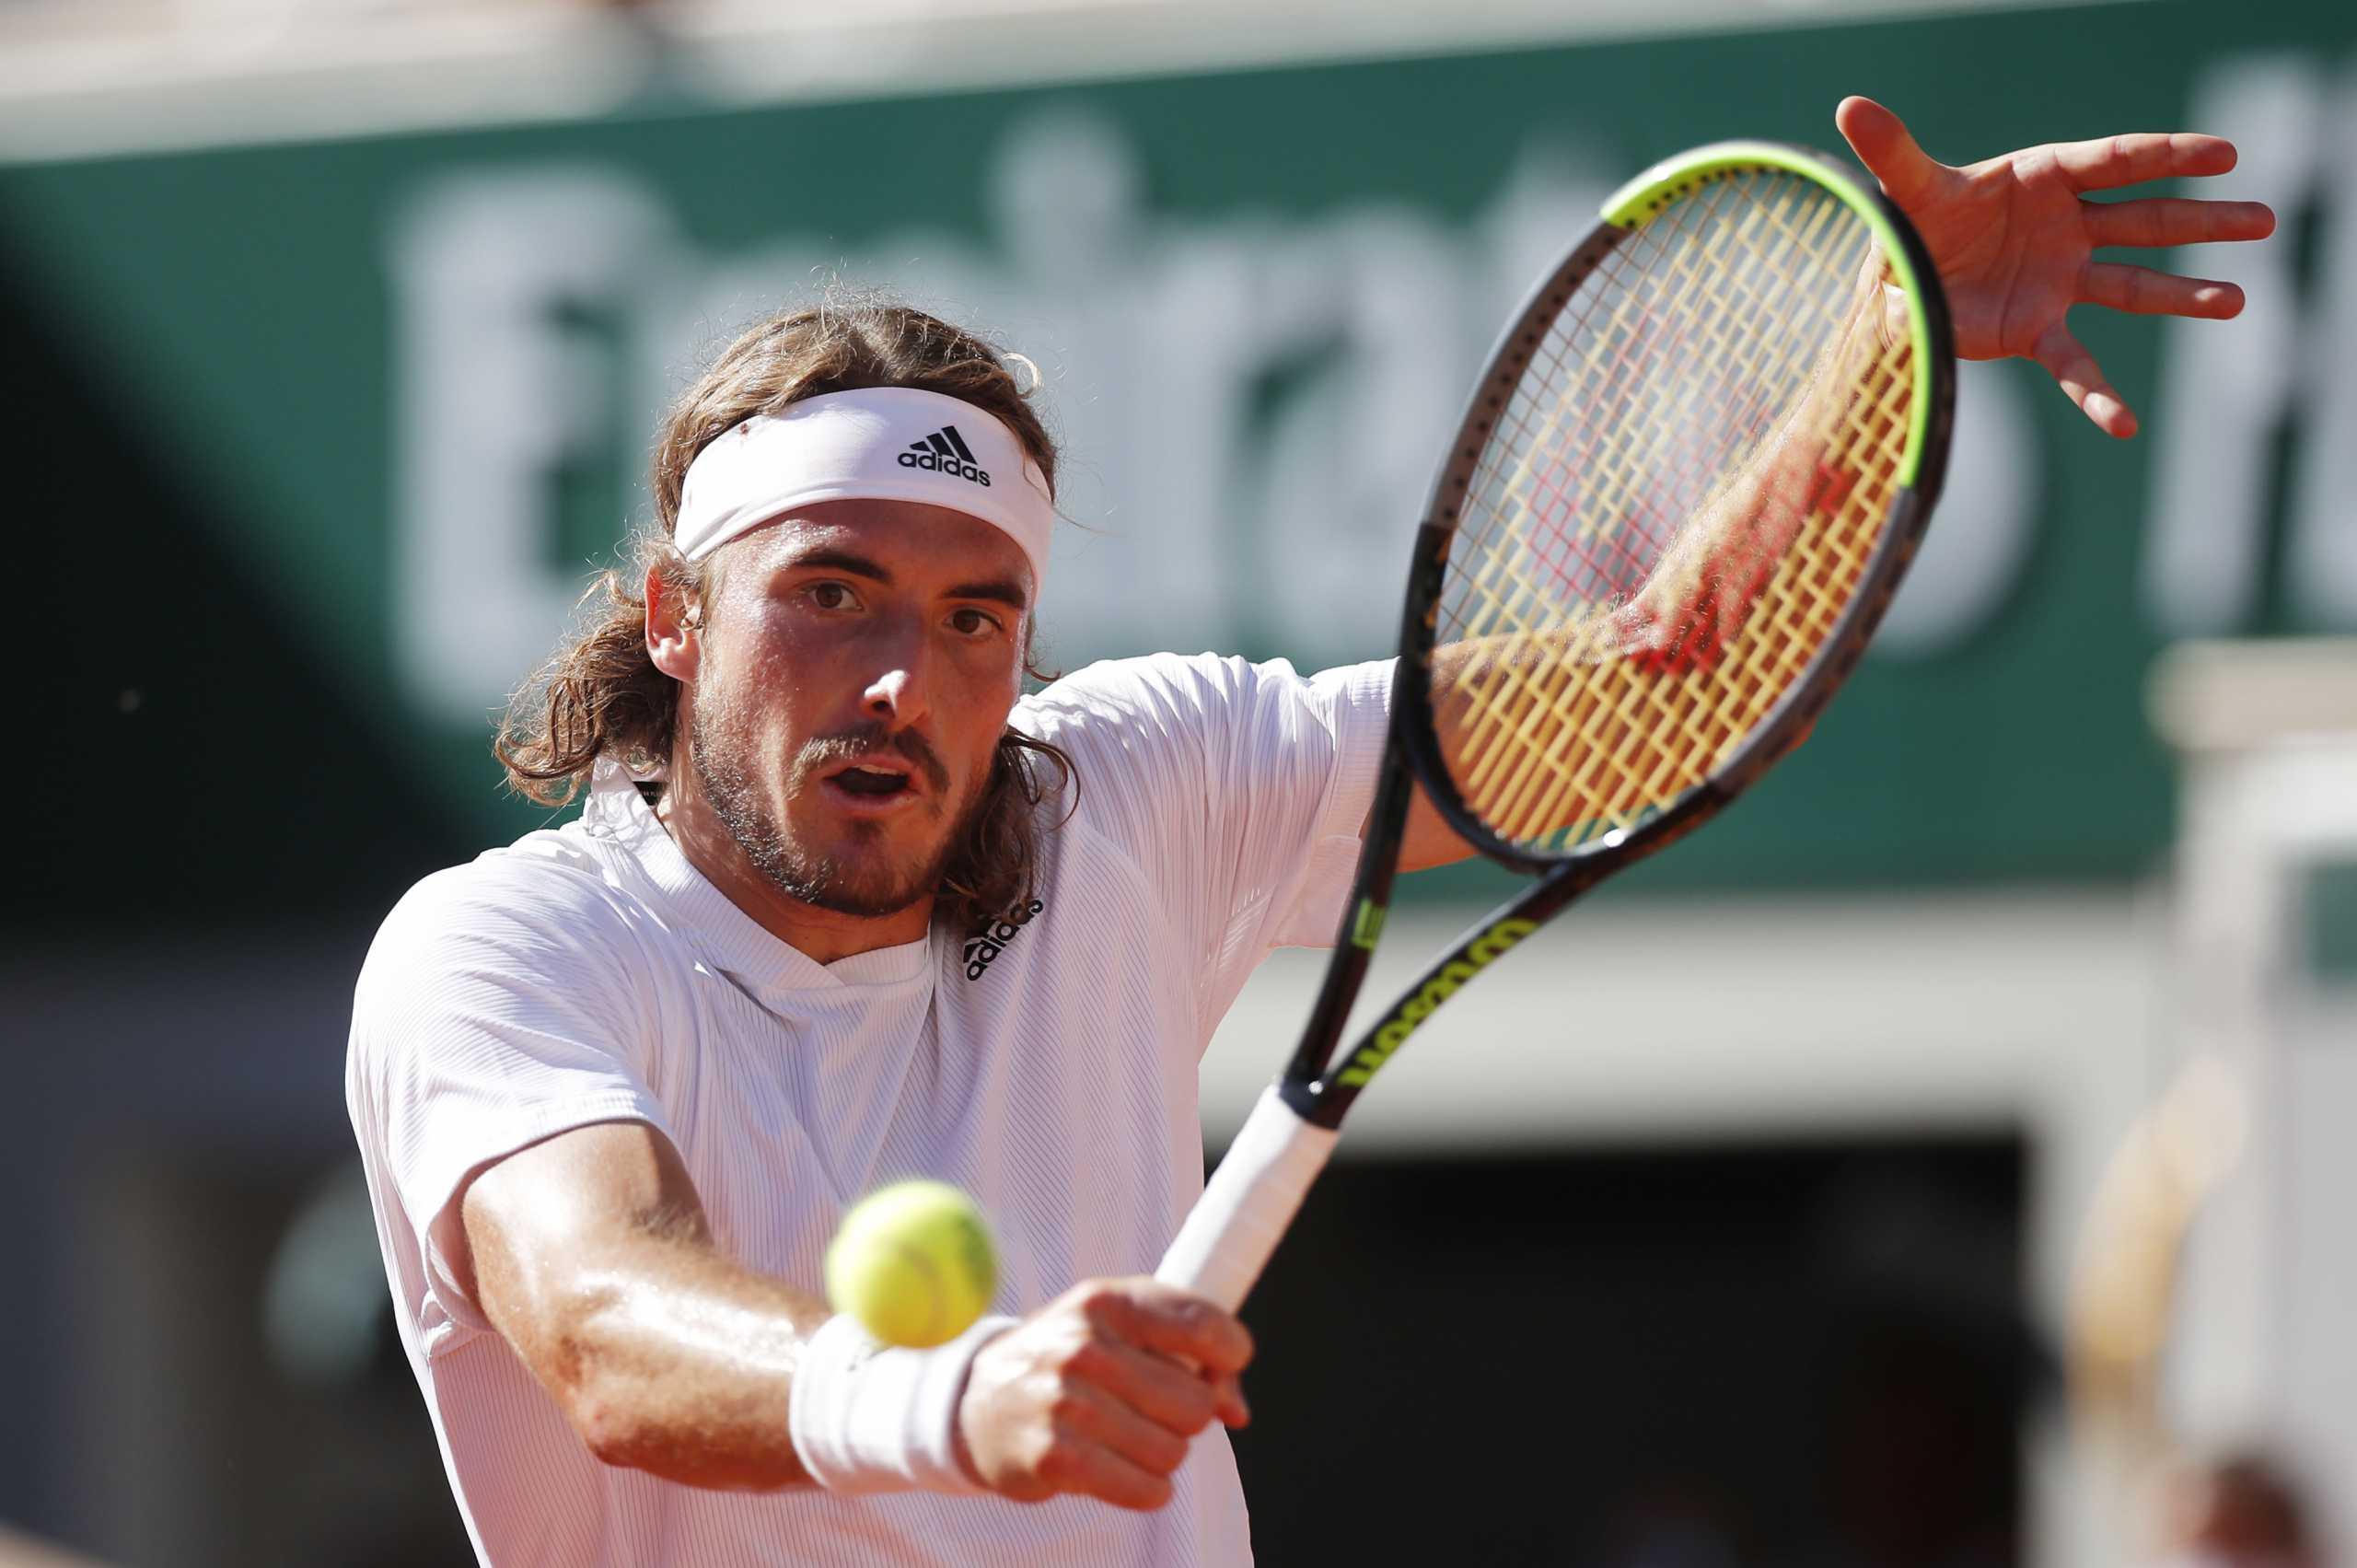 Wimbledon: Ο Στέφανος Τσιτσιπάς θα αγωνιστεί με τον αδερφό του στο διπλό